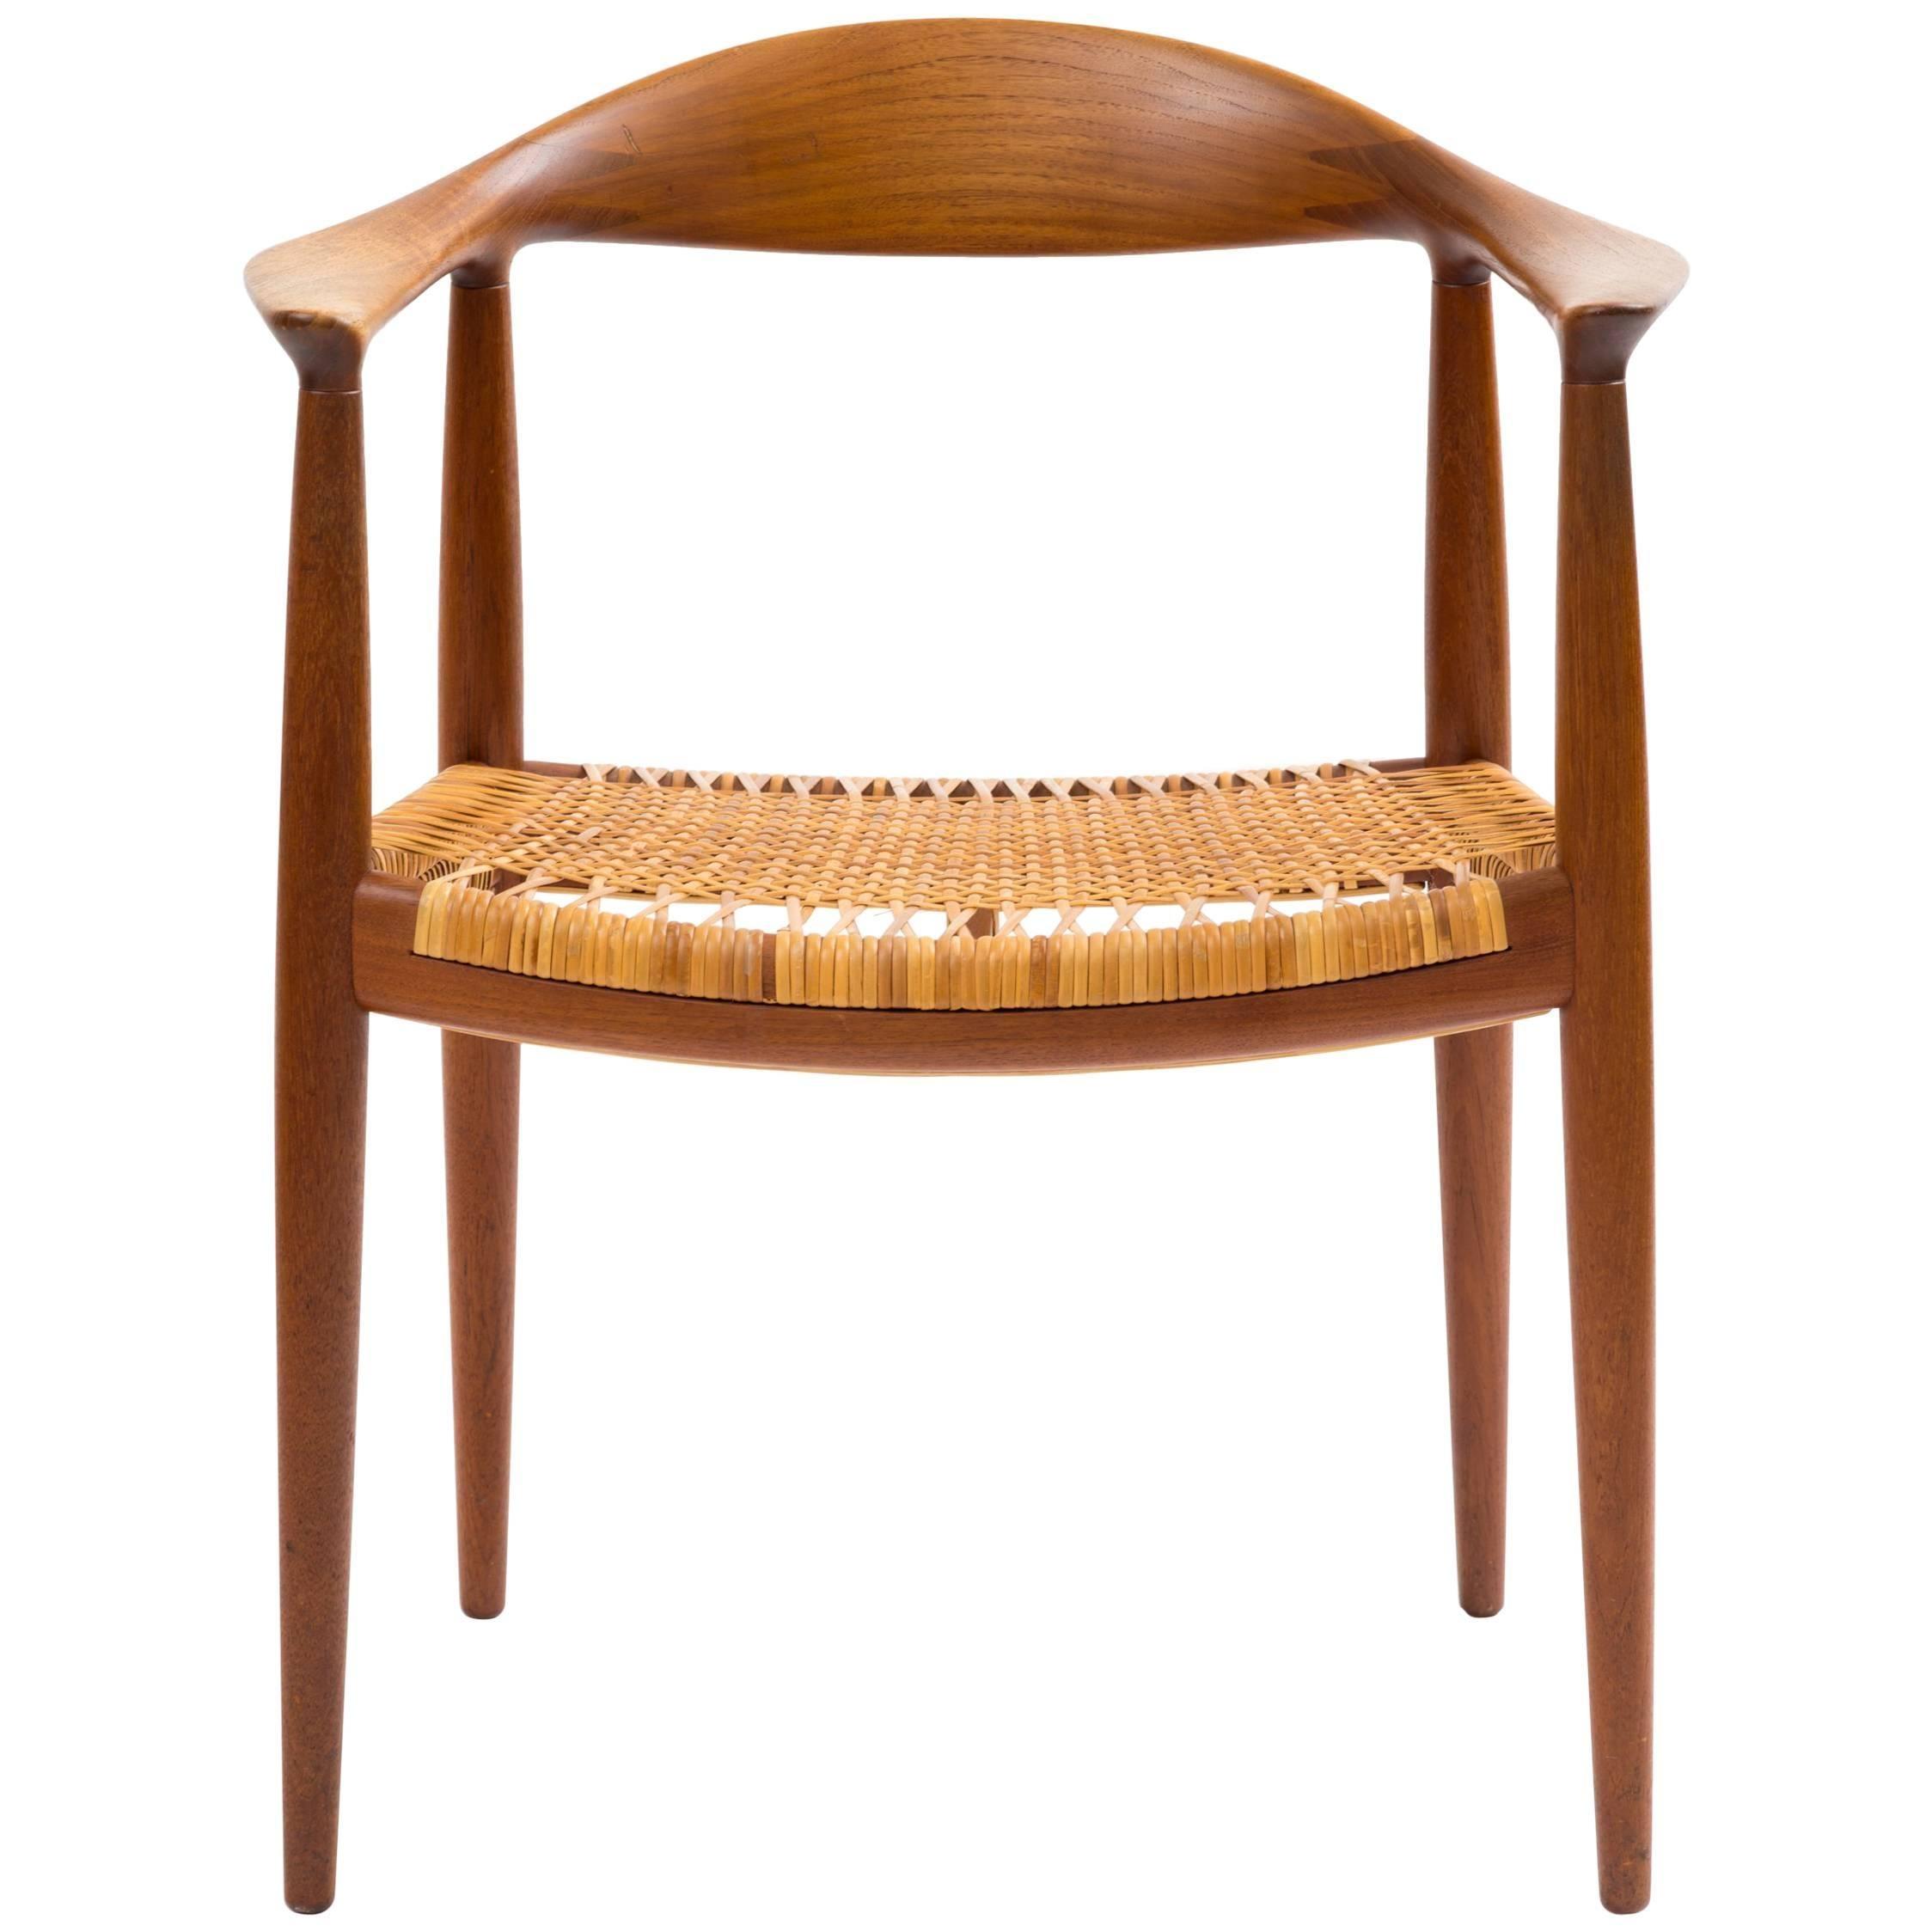 Hans J Wegner Round Chair in Teak with Original Cane Seat  sc 1 st  1stDibs & Hans J. Wegner Furniture - 946 For Sale at 1stdibs